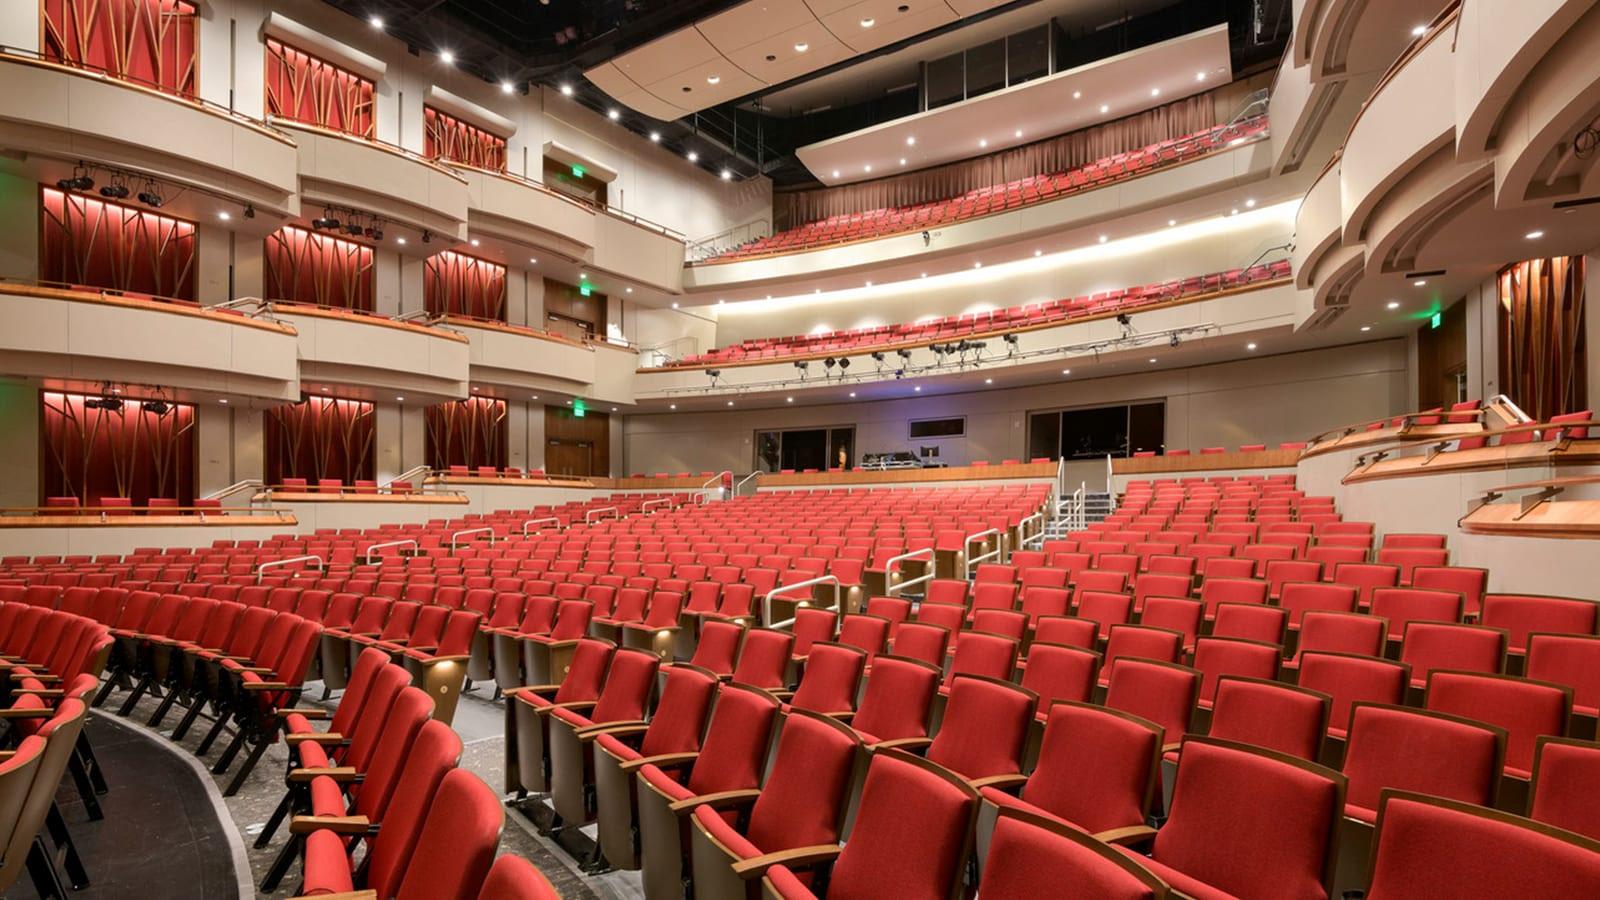 Sandy Springs City Center Auditorium Seating